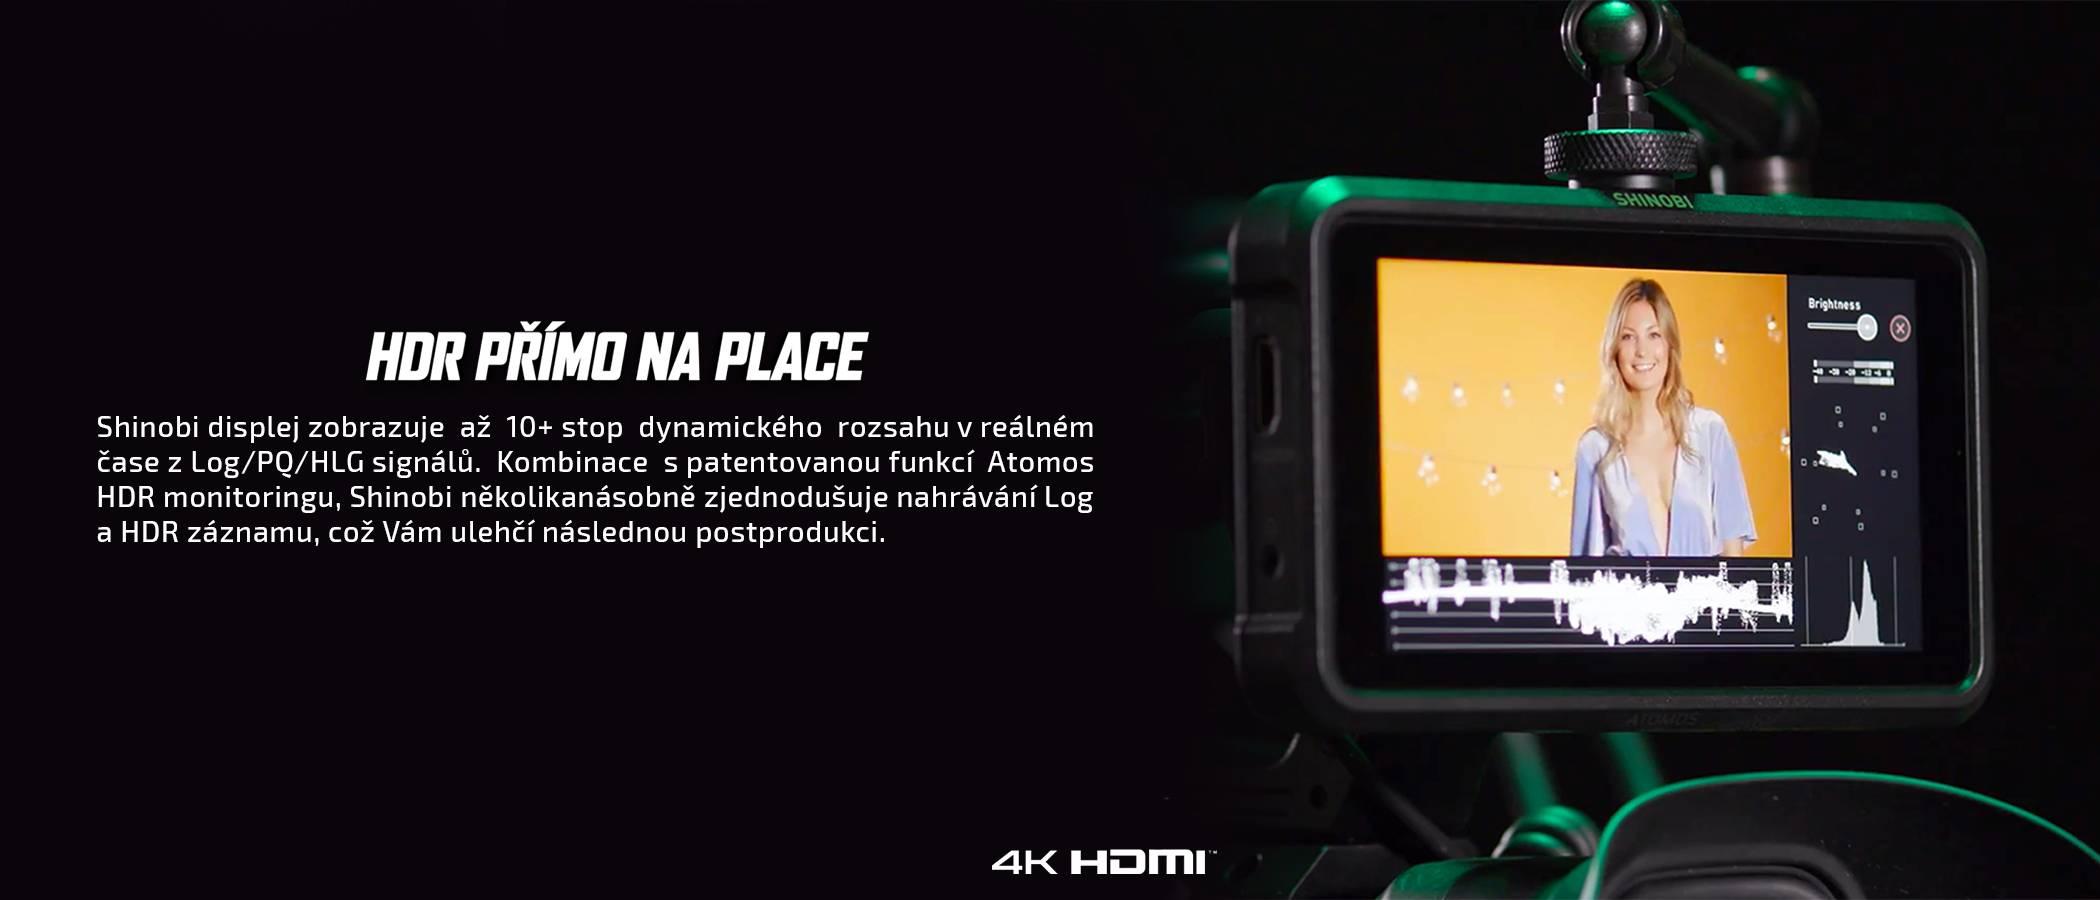 film-technika-atomos-shinobi-hdmi-5-inc-náhledový-monitor-hdr-přímo-na-place